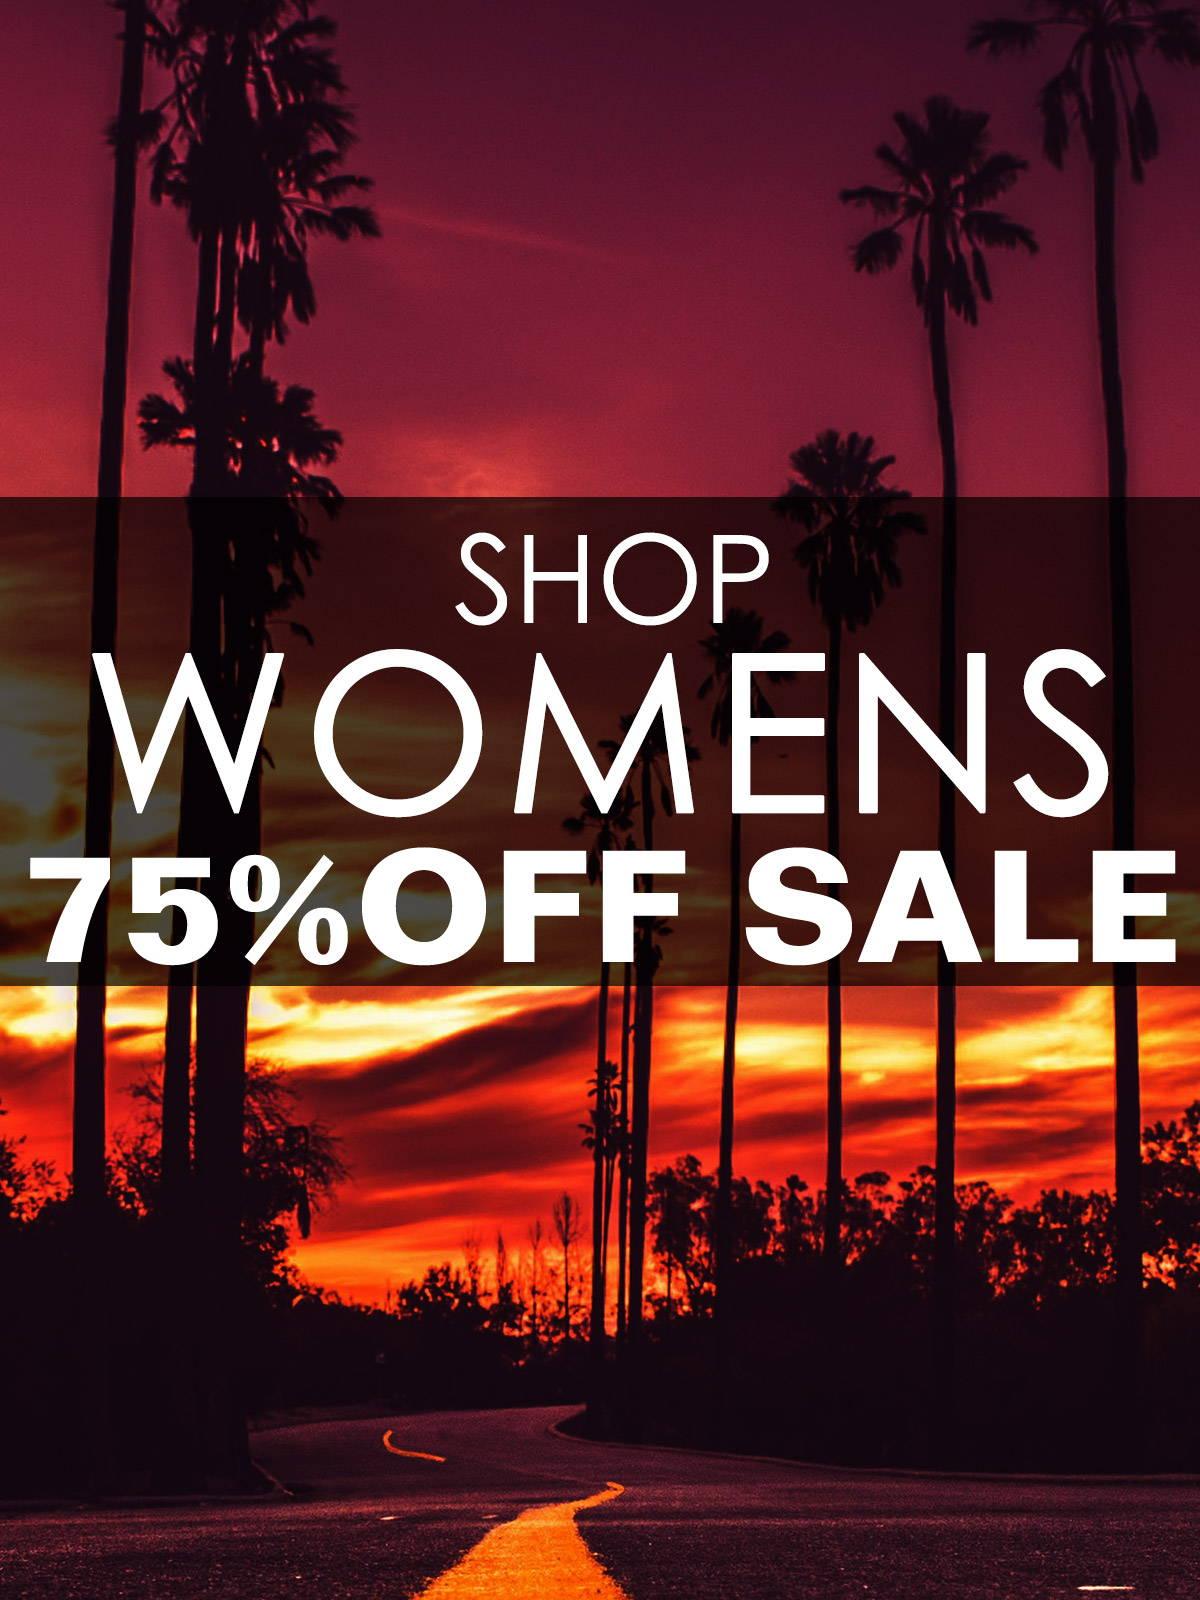 Shop the Womens 75% Off Sale